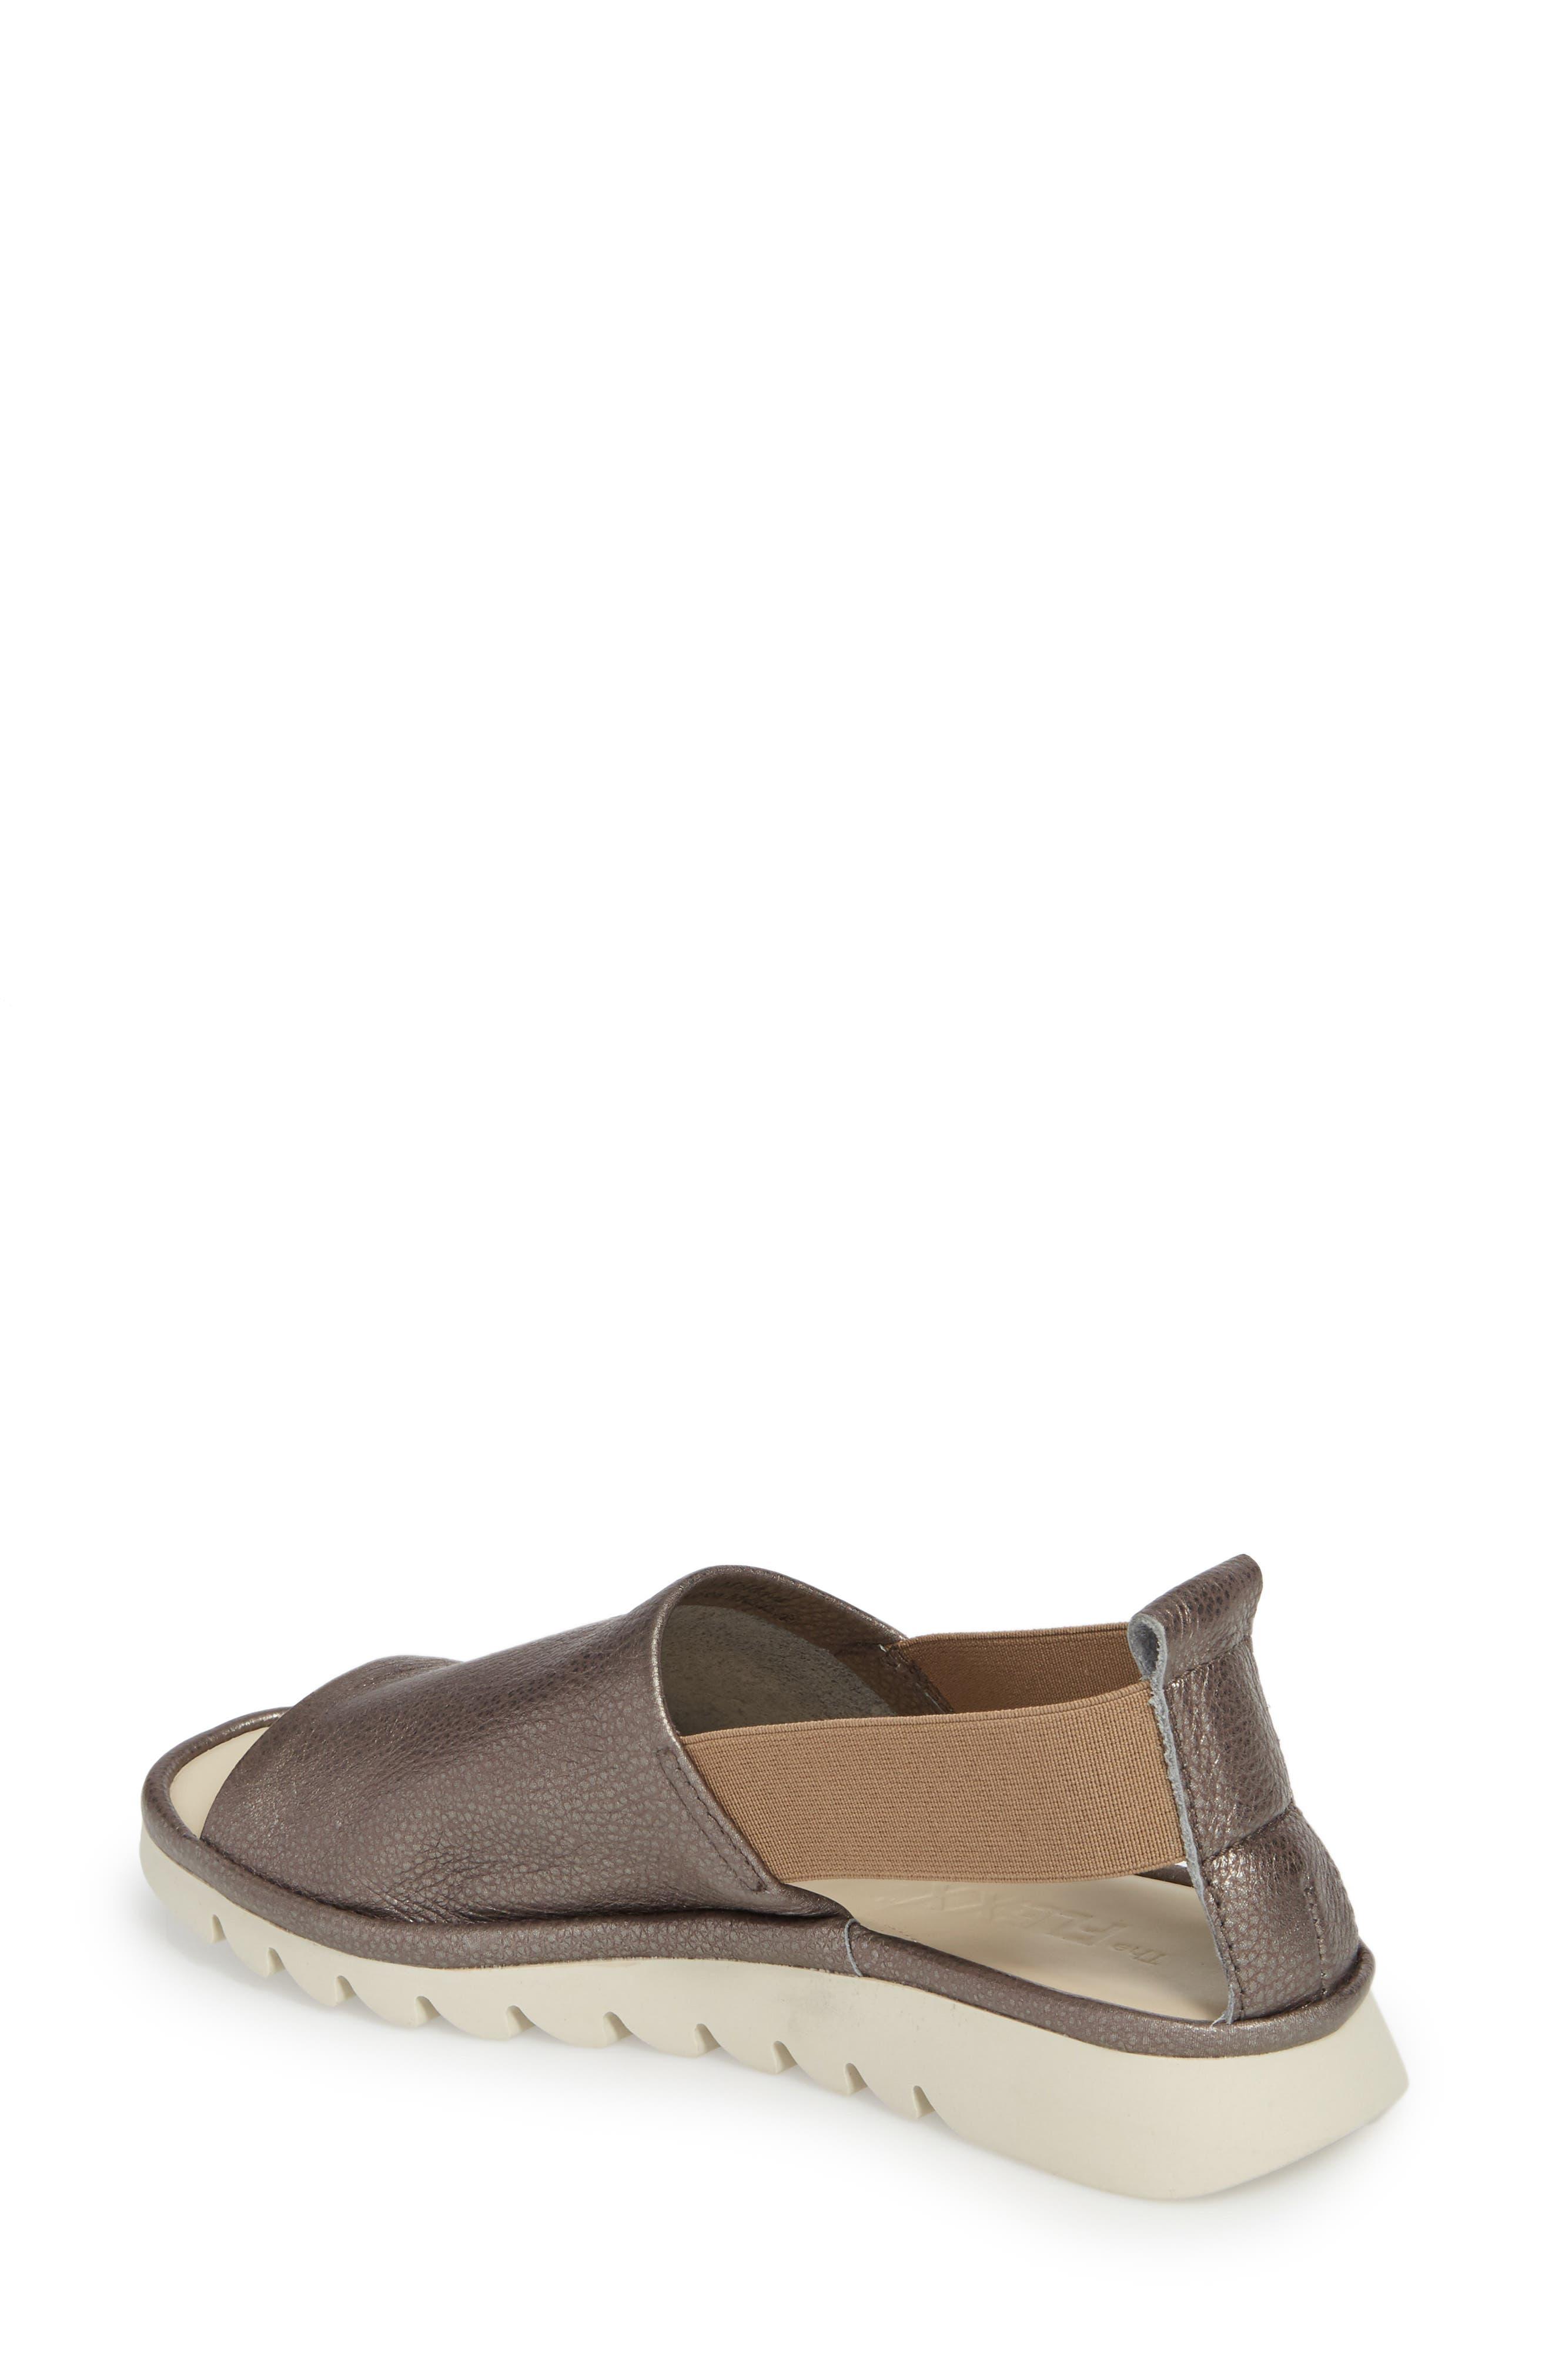 Shore Line Sandal,                             Alternate thumbnail 2, color,                             Canna Di Fucile Leather